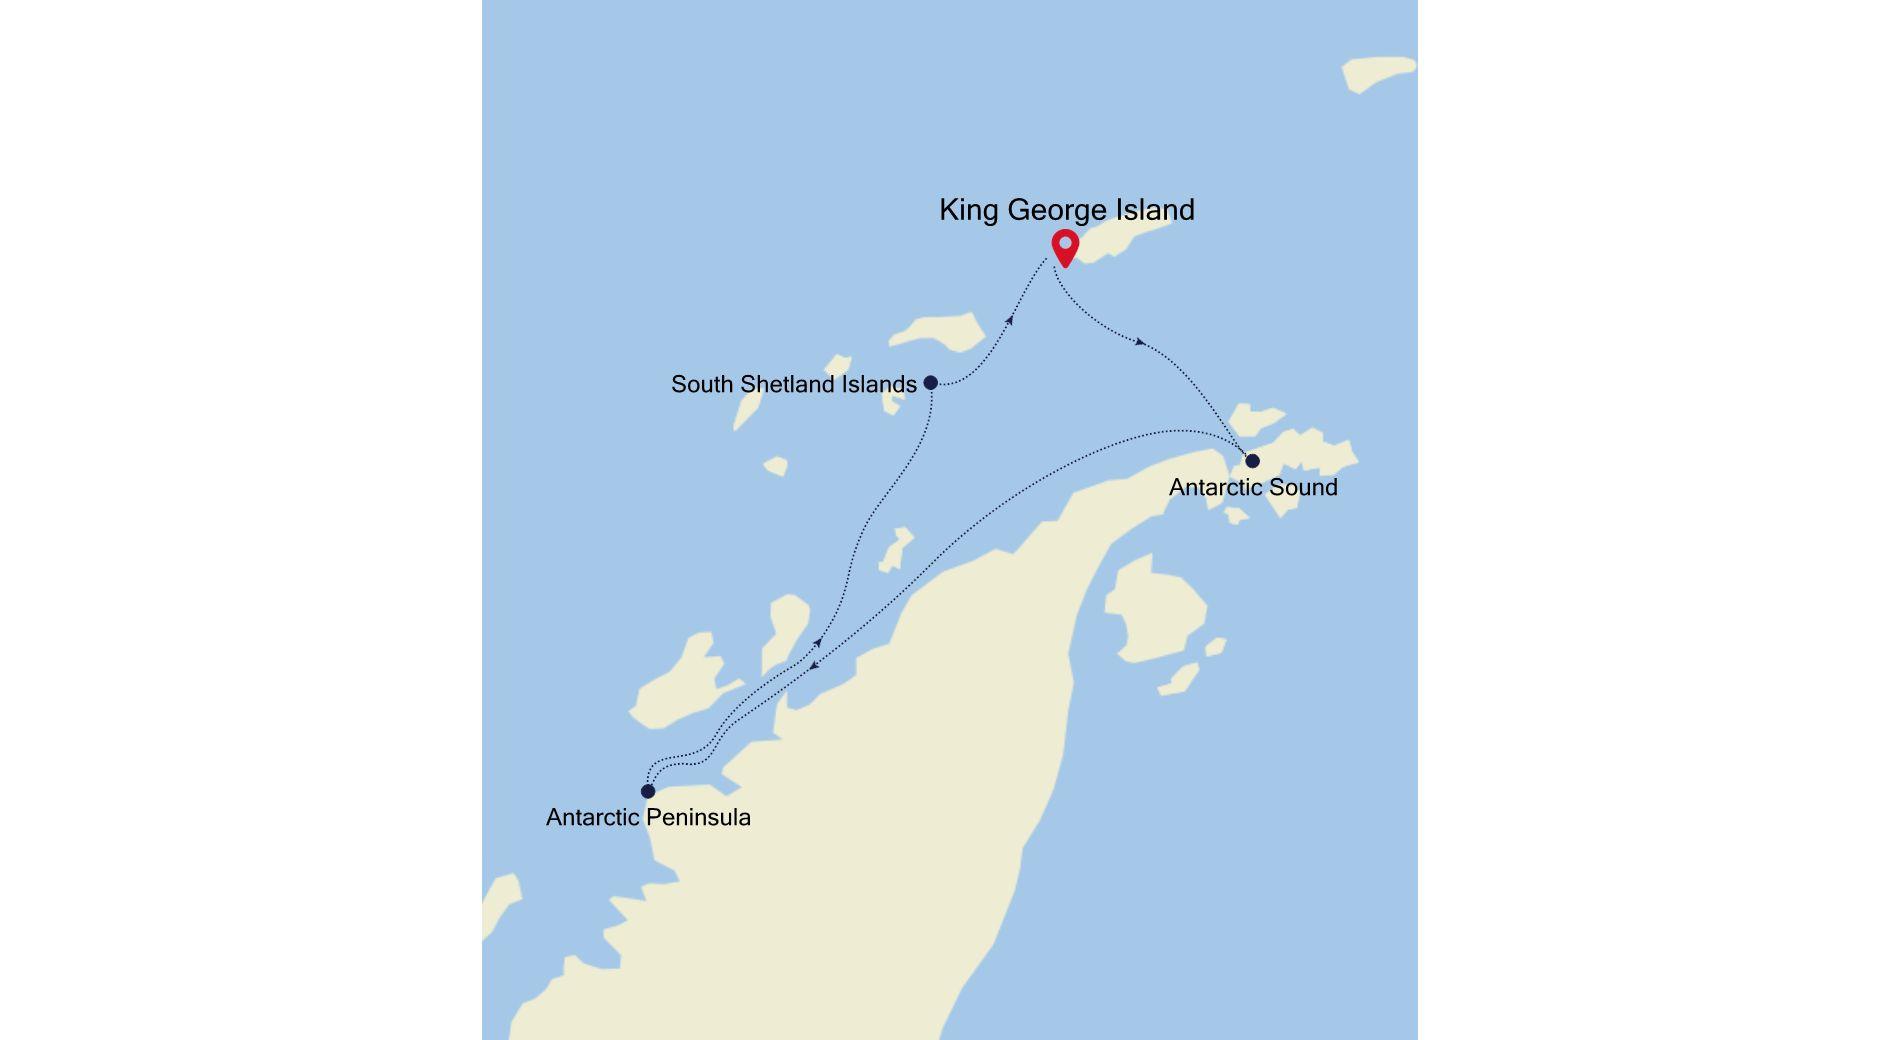 E1211223006 - King George Island to King George Island